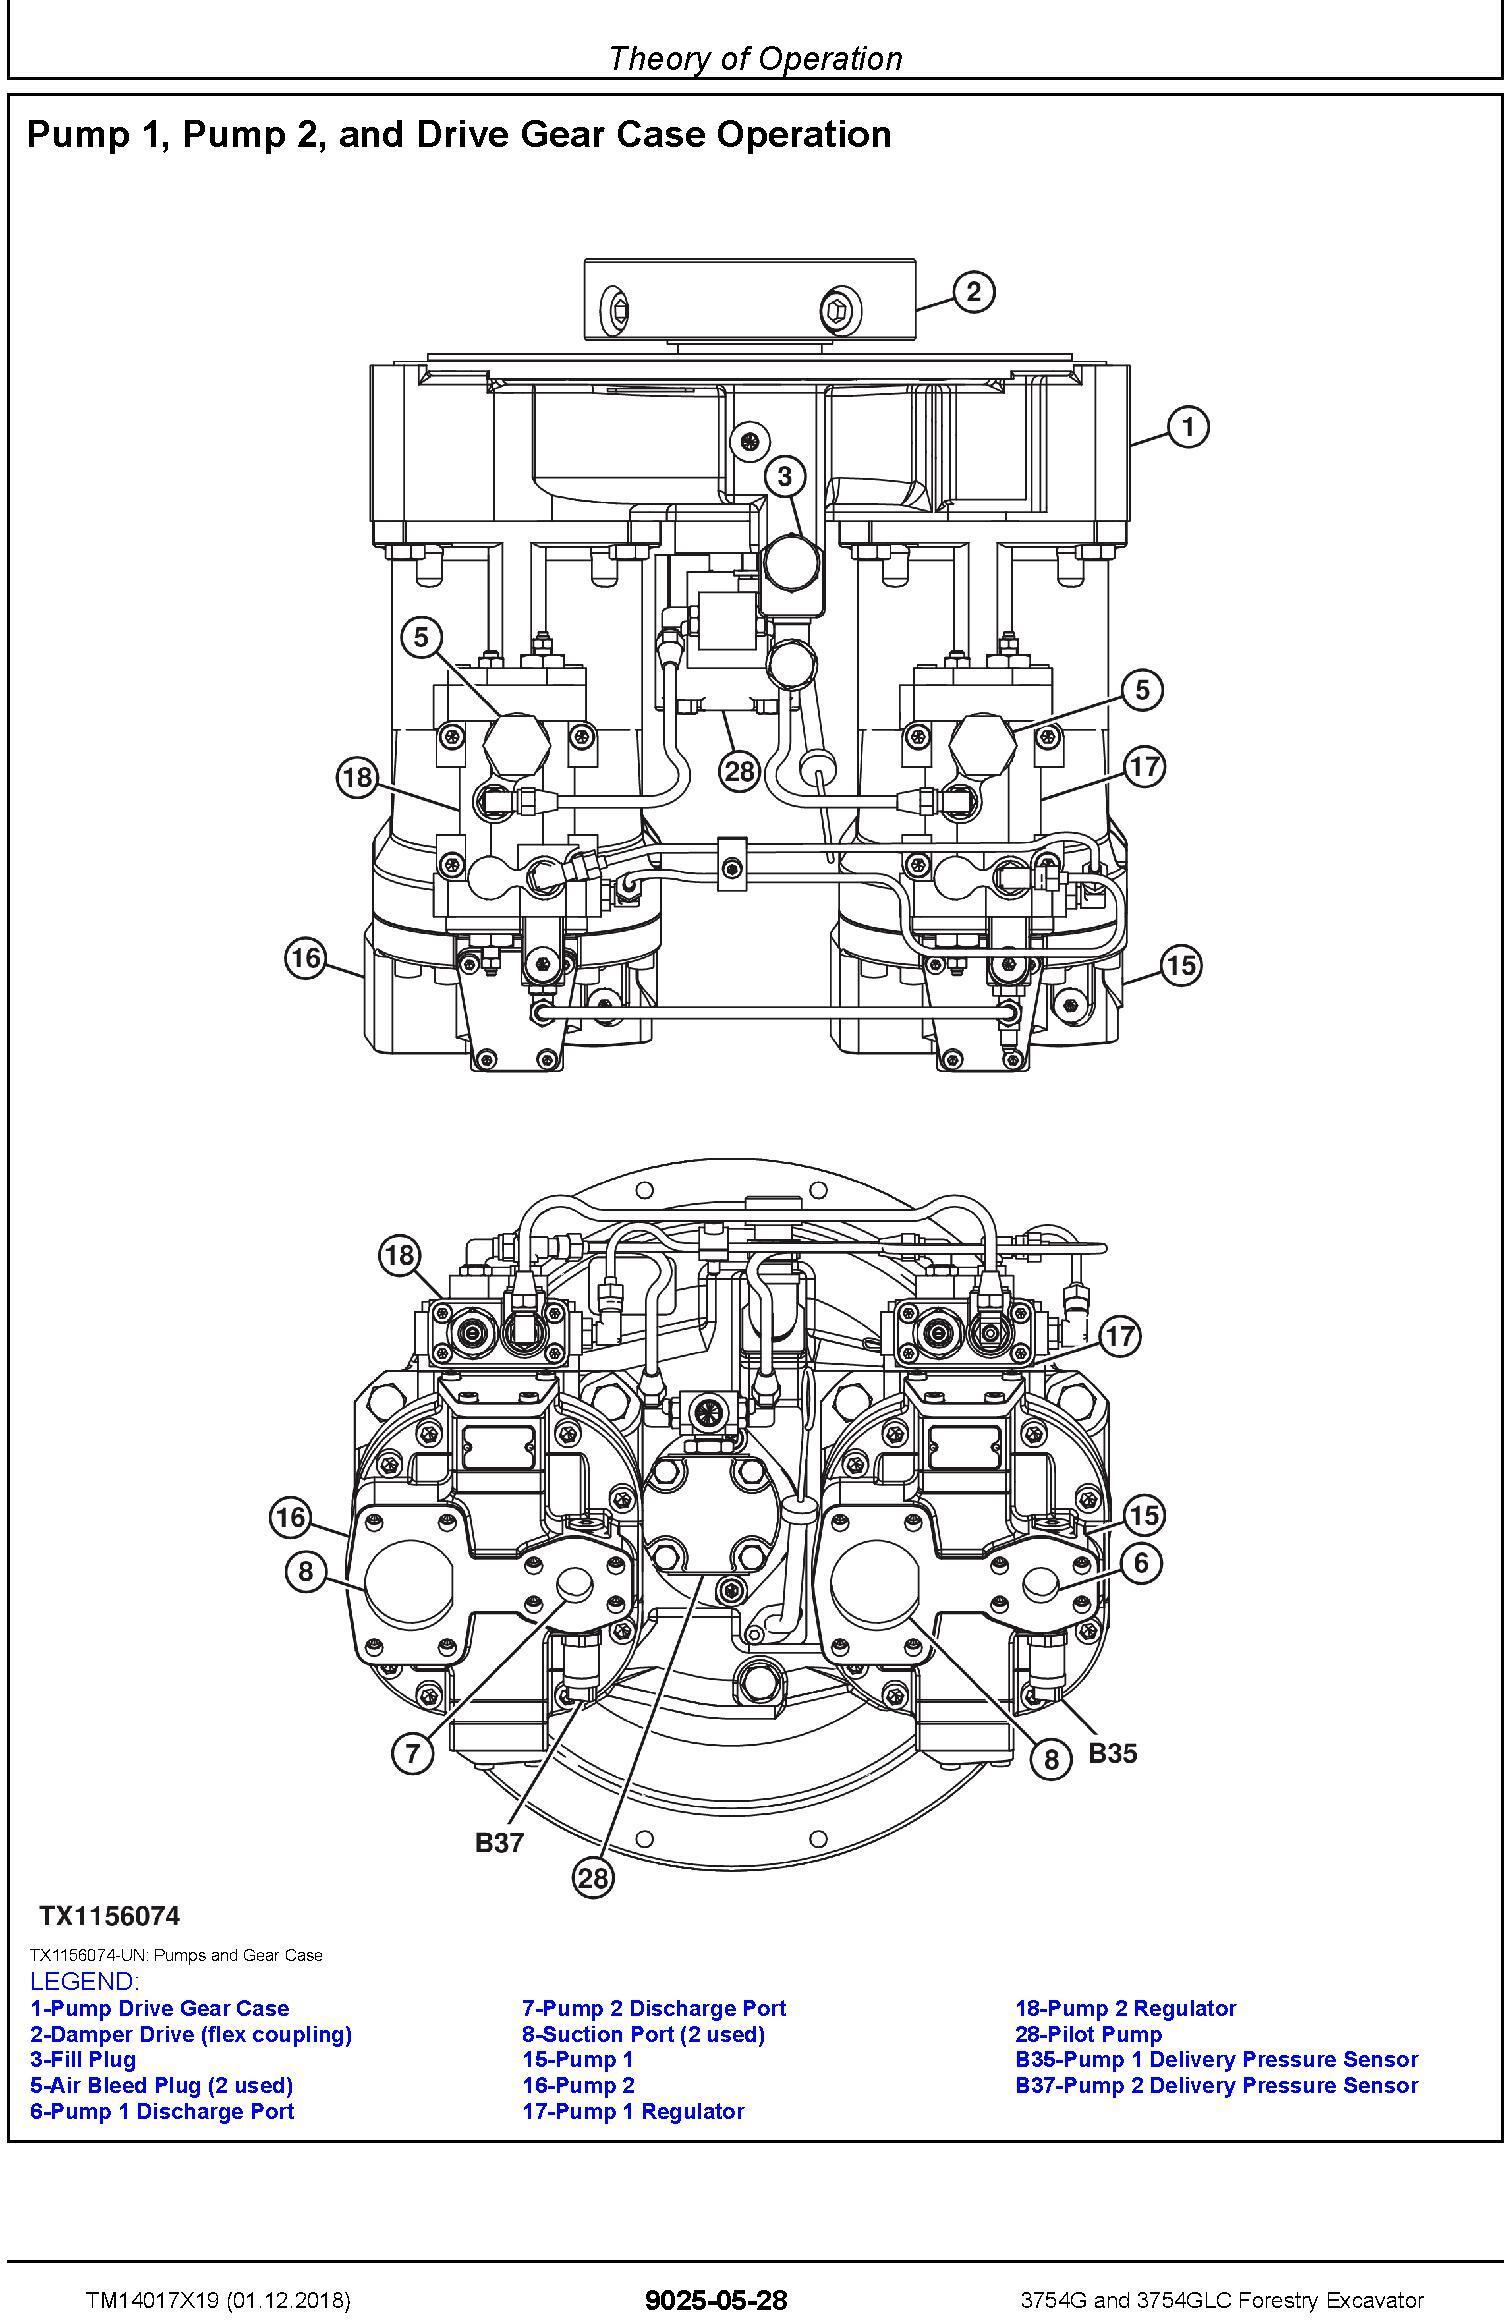 John Deere 3754G, 3754GLC (SN. D371001-) Forestry Excavator Diagnostic Technical Manual (TM14017X19) - 3